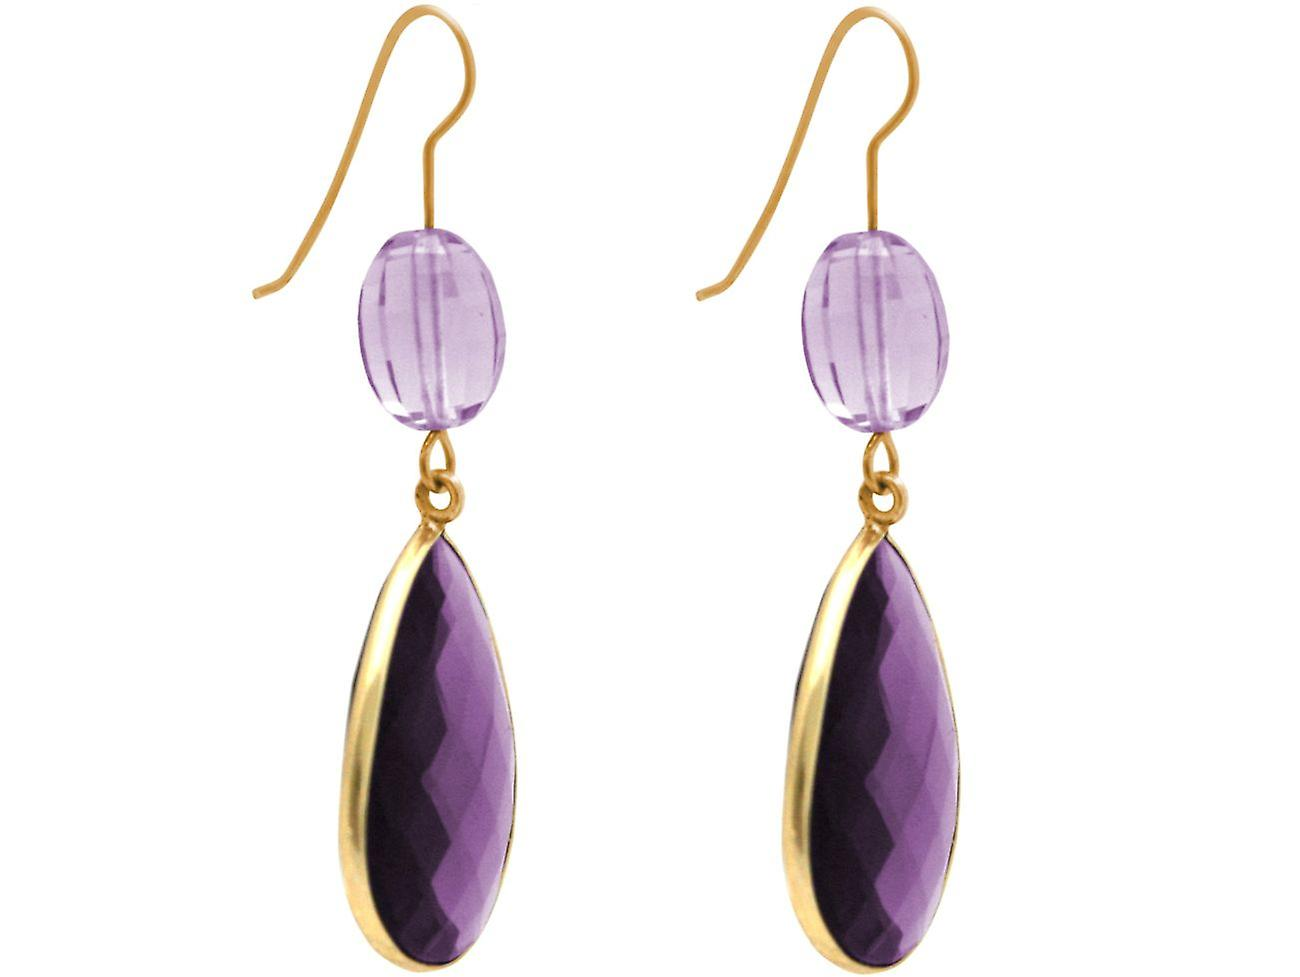 Gemshine Ohrringe lila und Lavendel Amethyst Tropfen in 925 Silber vergoldet